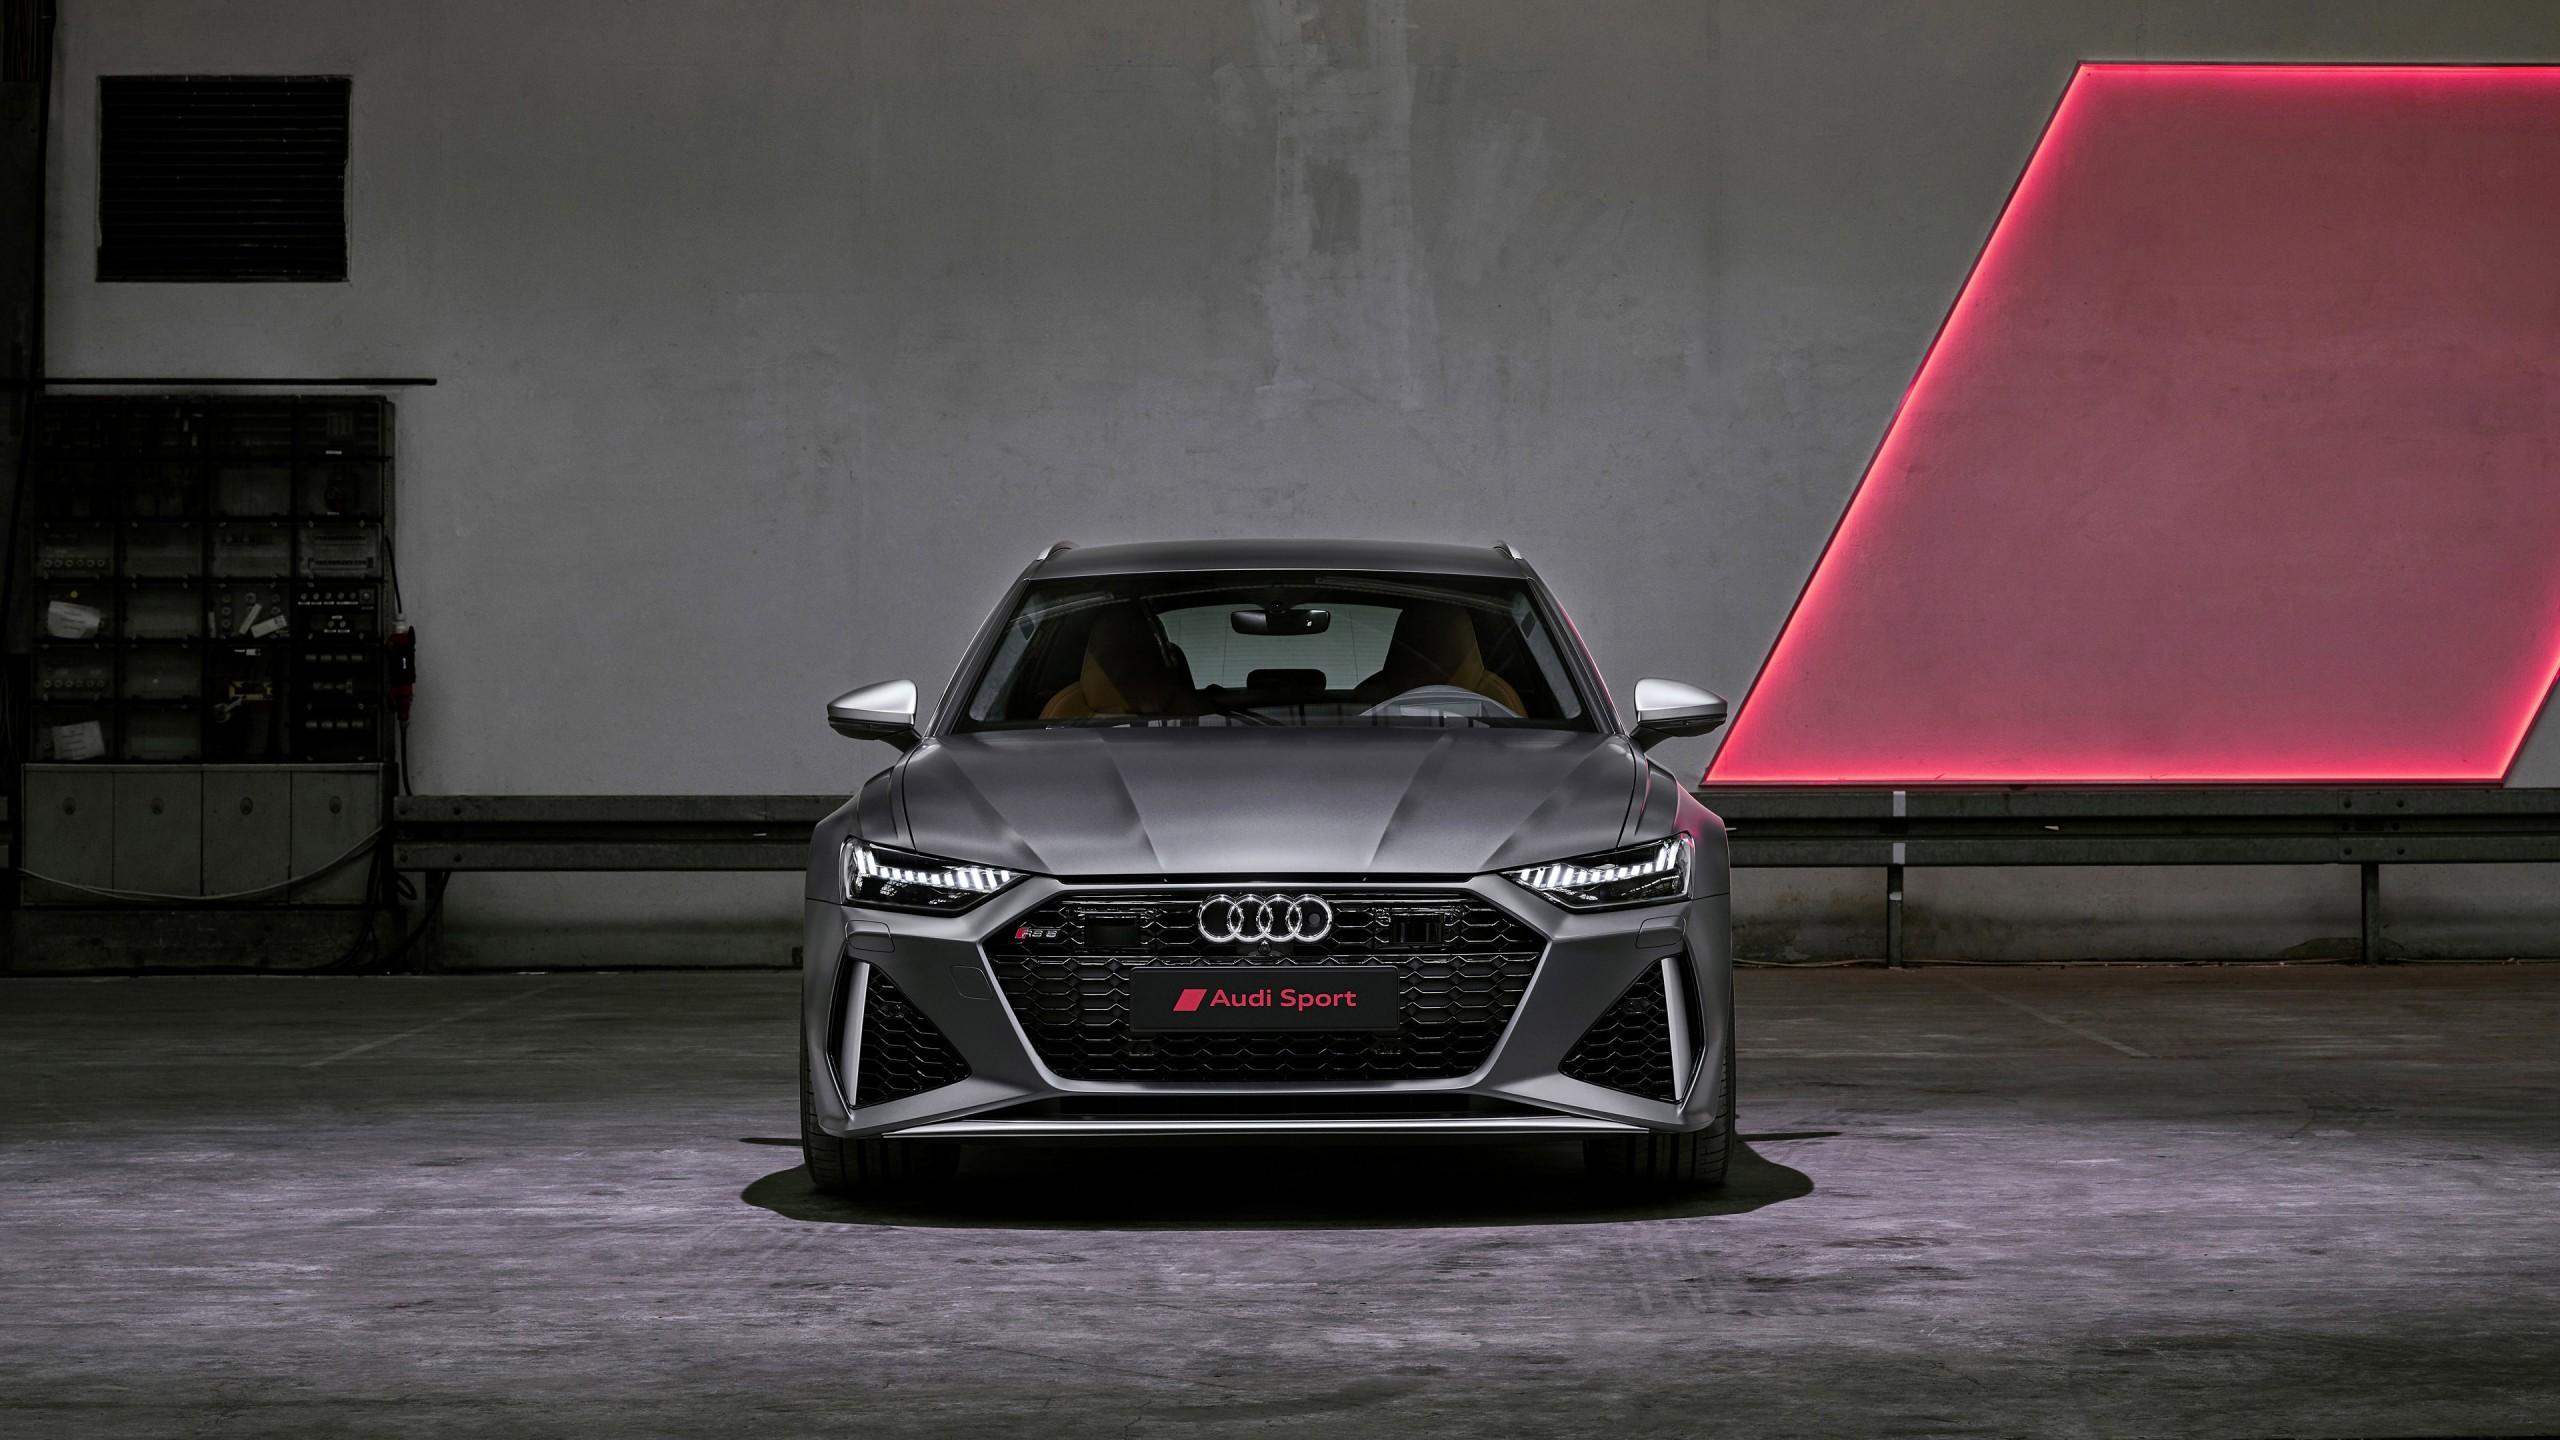 2020 Audi Rs6 Avant 4k 2 Wallpaper Hd Car Wallpapers